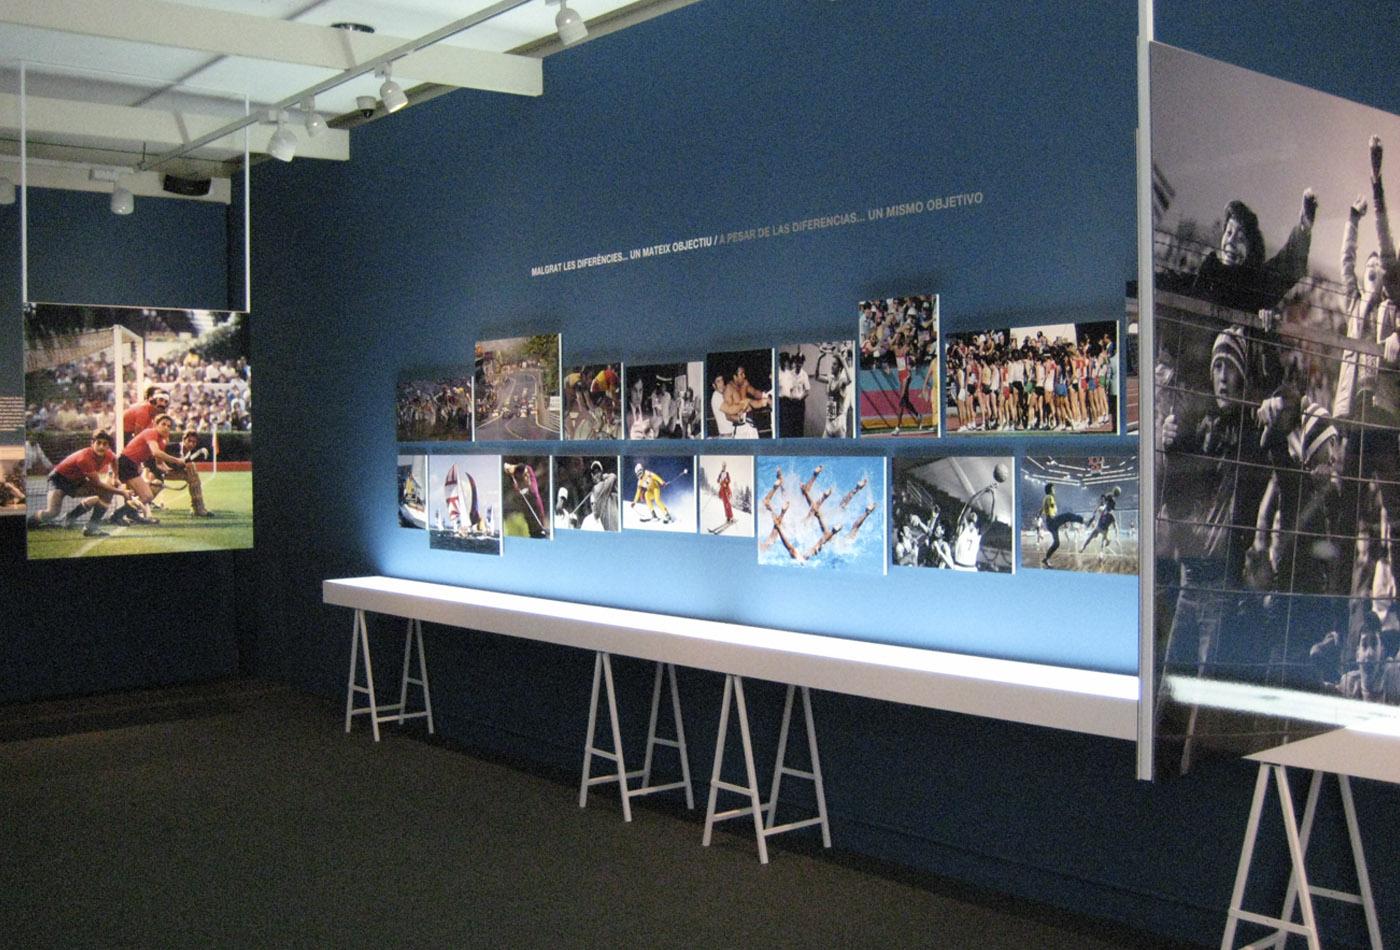 deporte-creartiva-disseny-caixaforum-avelino-pi-sports-exposicio-